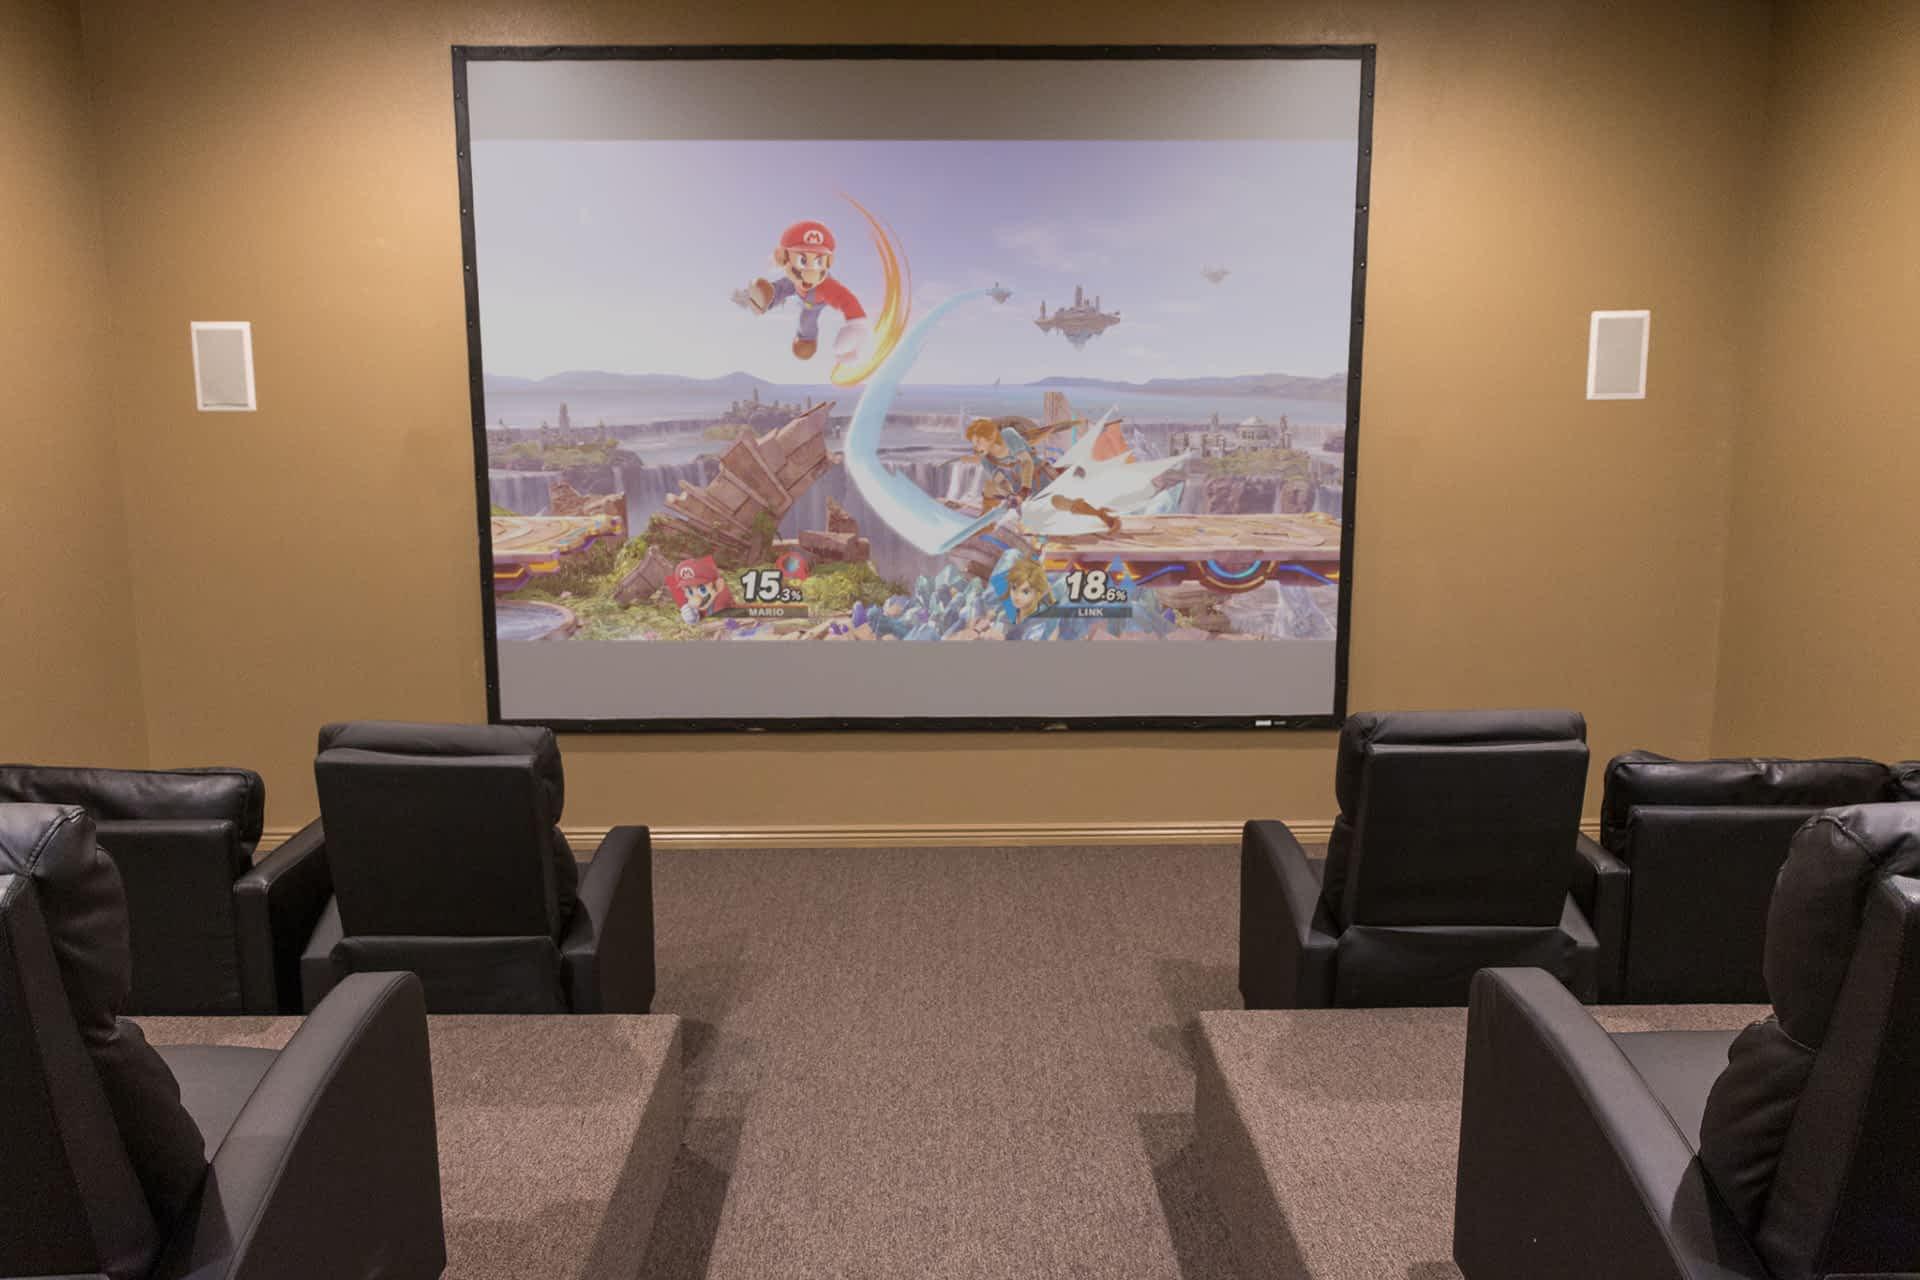 Movie Theater Amenity